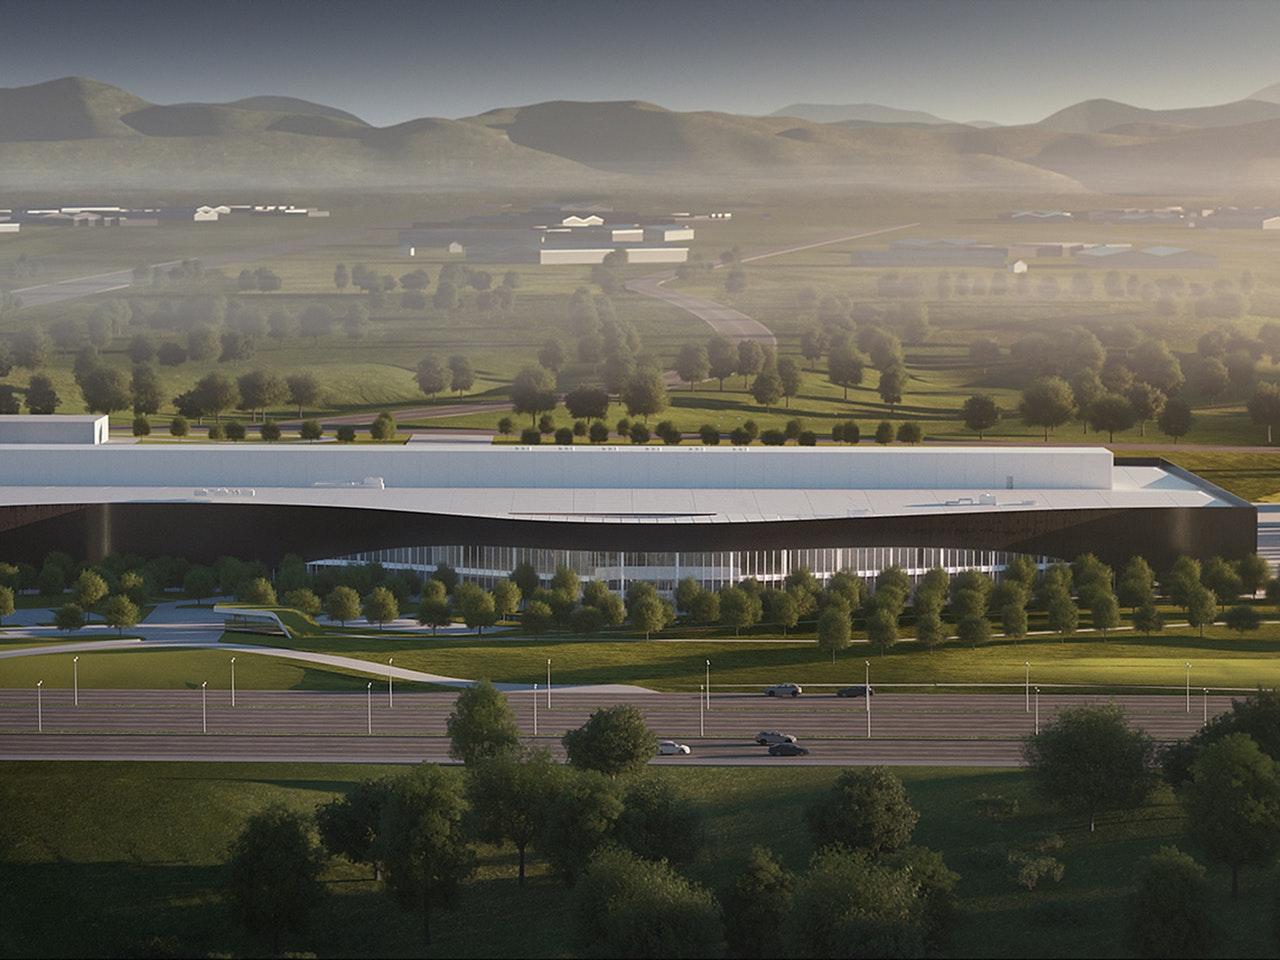 Volvo starts construction of its Polestar production centre